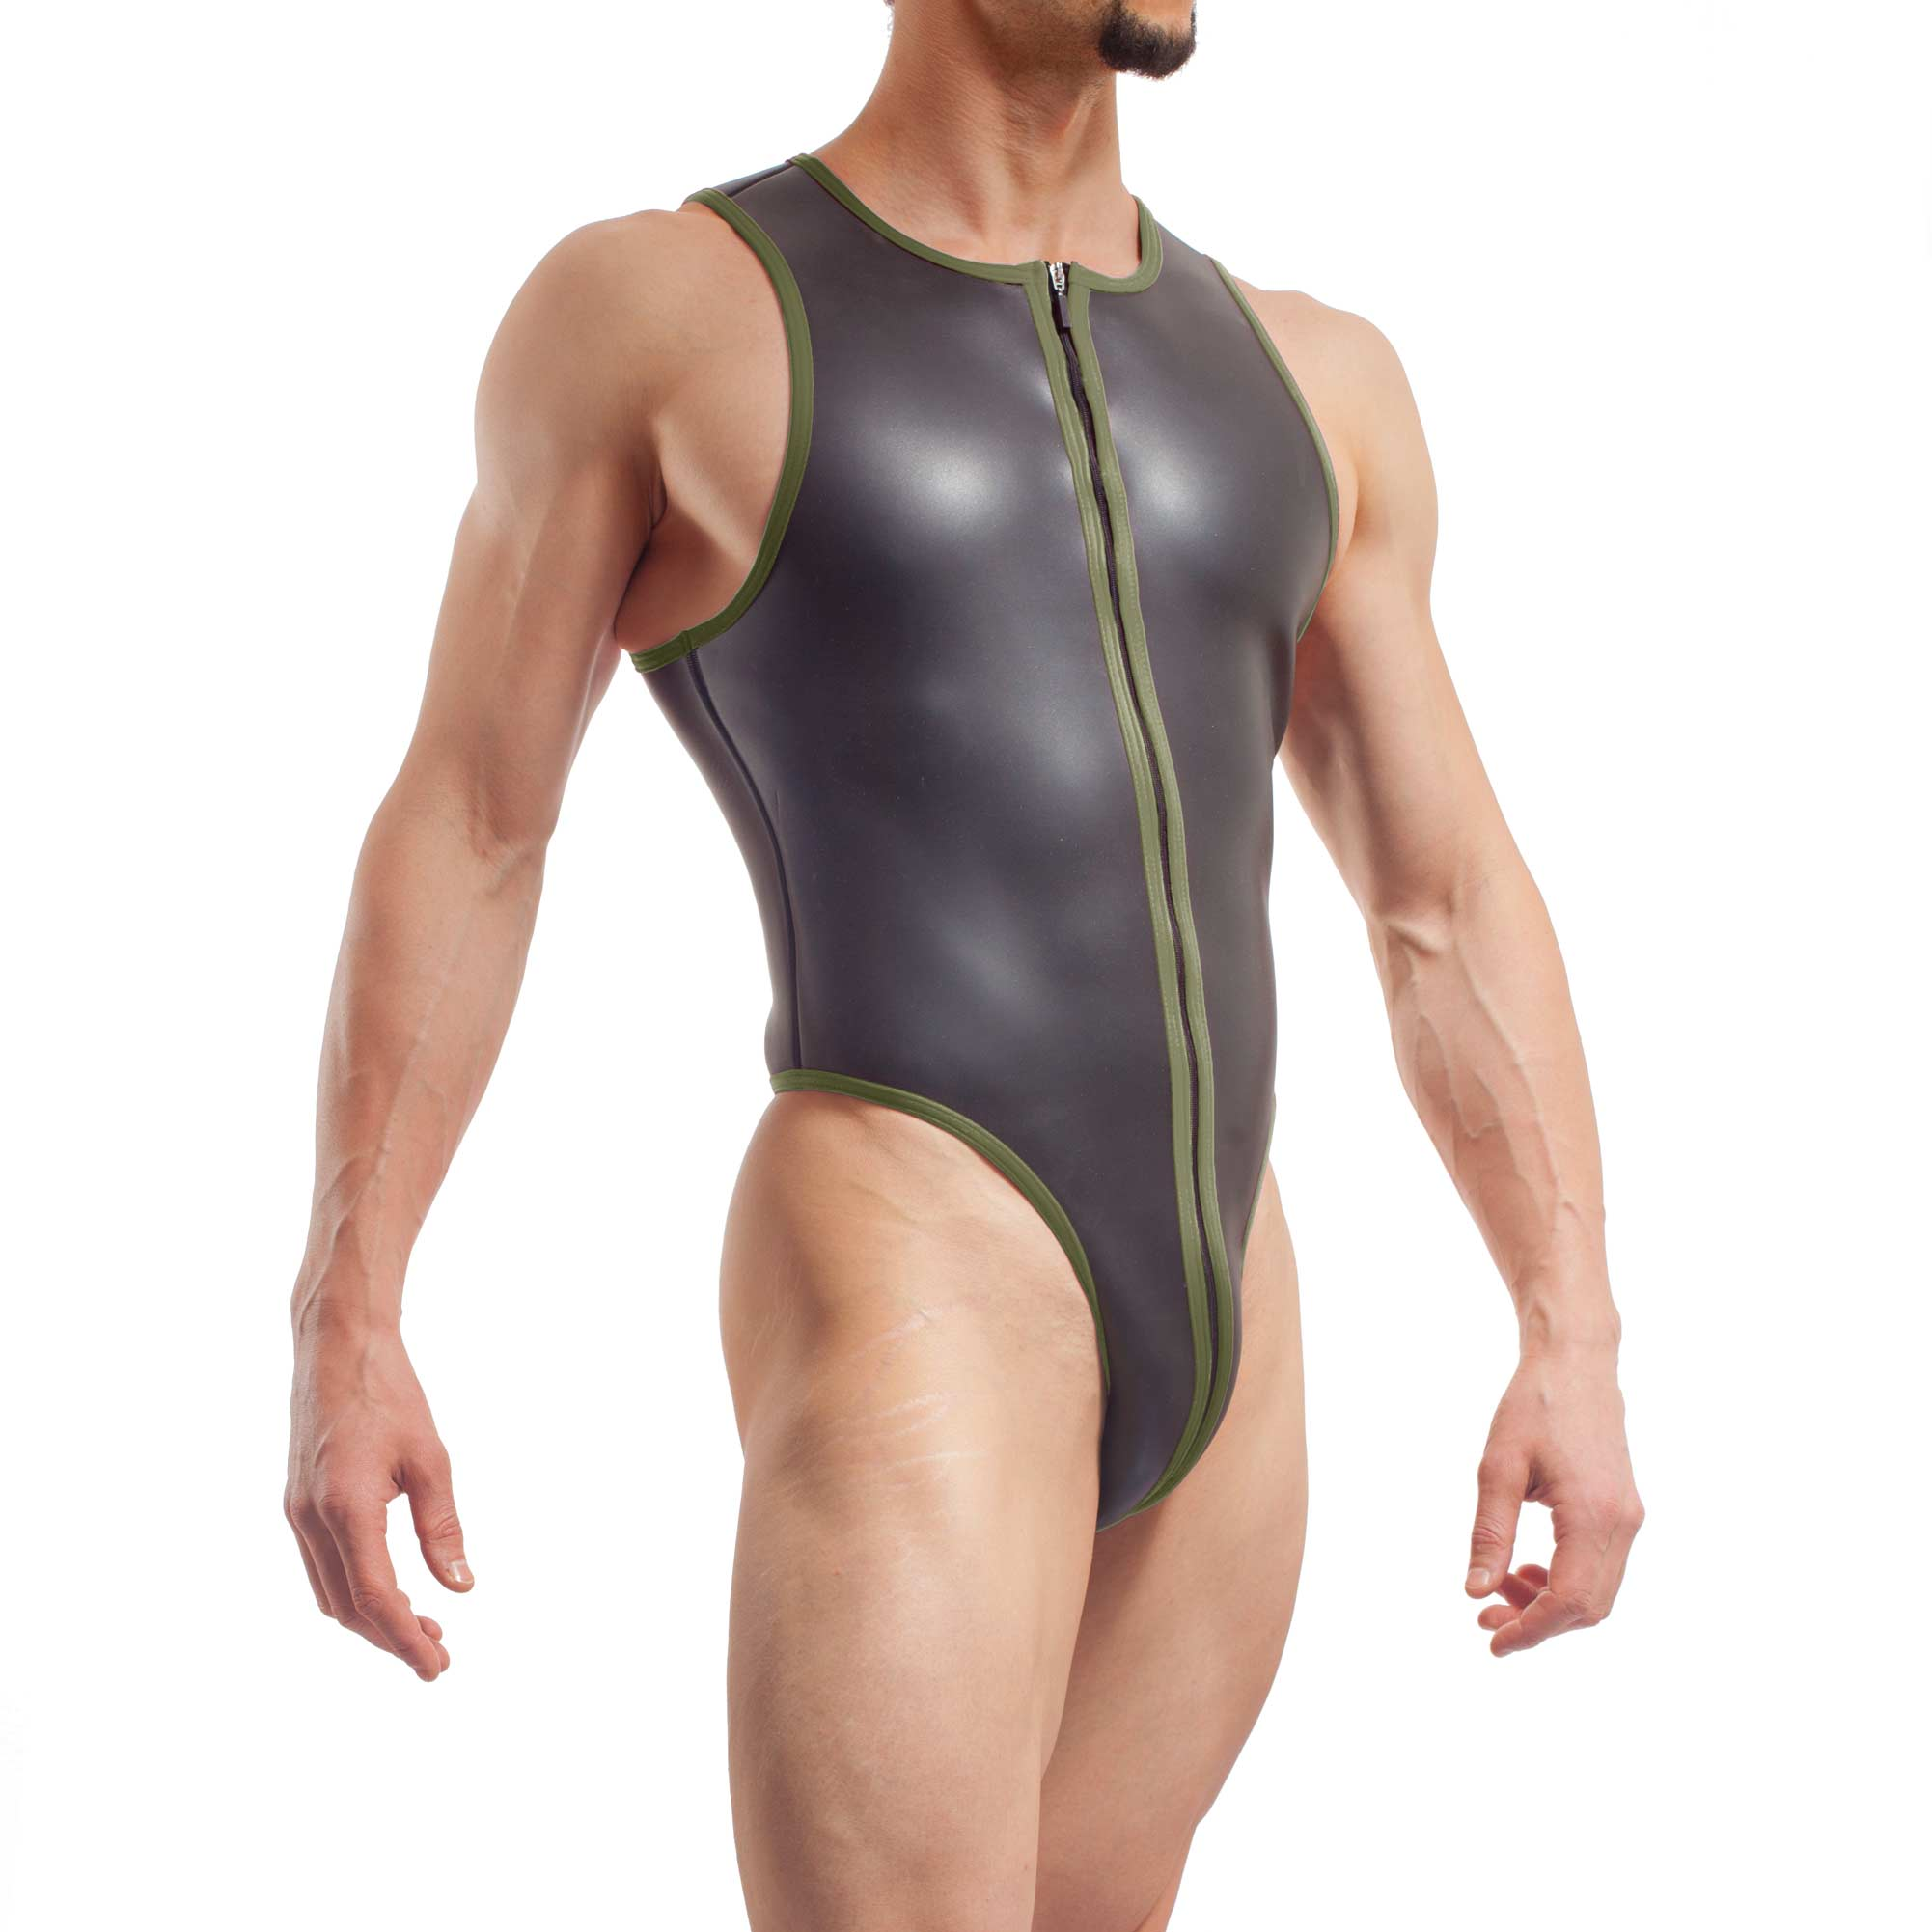 neopren string body, Wojoer Neopren Body, String Body, Glatthautneopren, Männer Ganzkörpernazug, String Shorty, Herren Badeanzug, navi